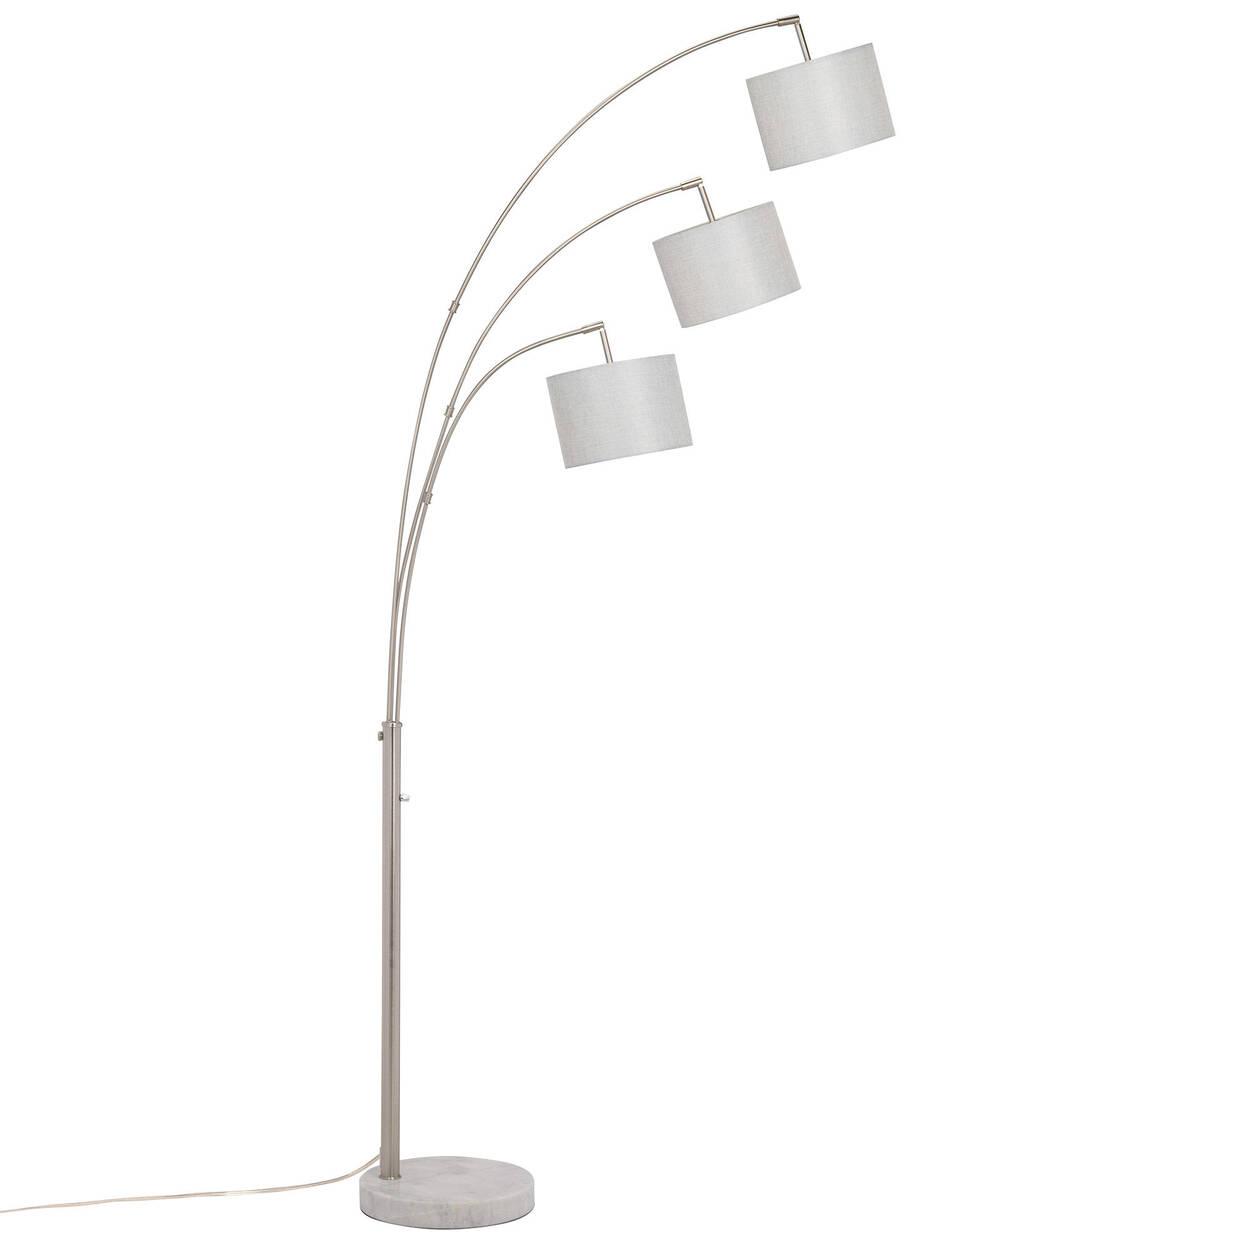 3-Head Floor Lamp with Marble Base | Bouclair.com